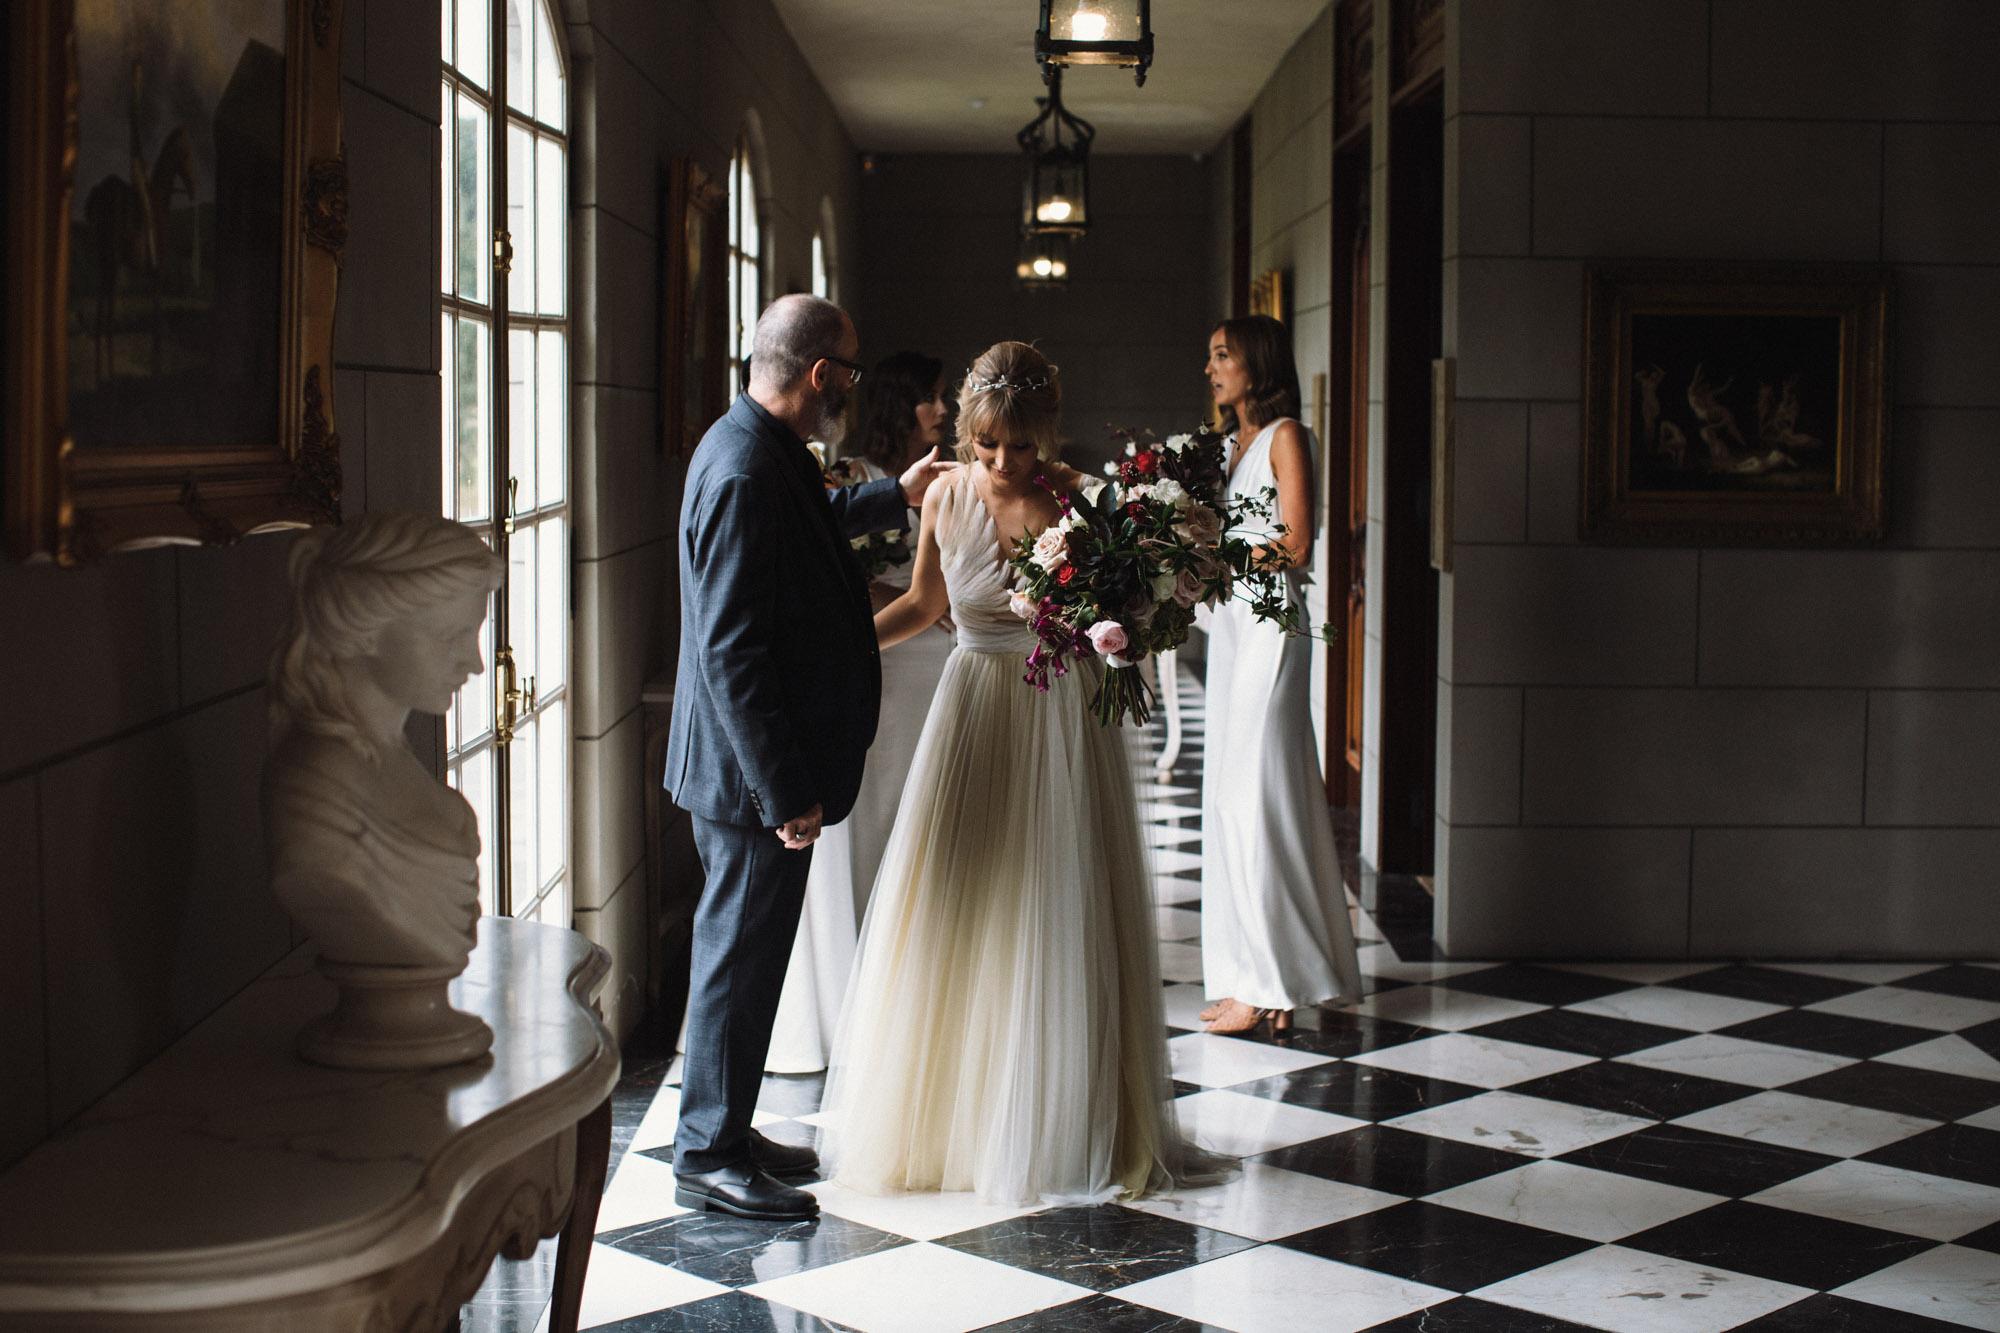 Campbell Point House Wedding HJ + Dean Raphael Weddings-54.jpg